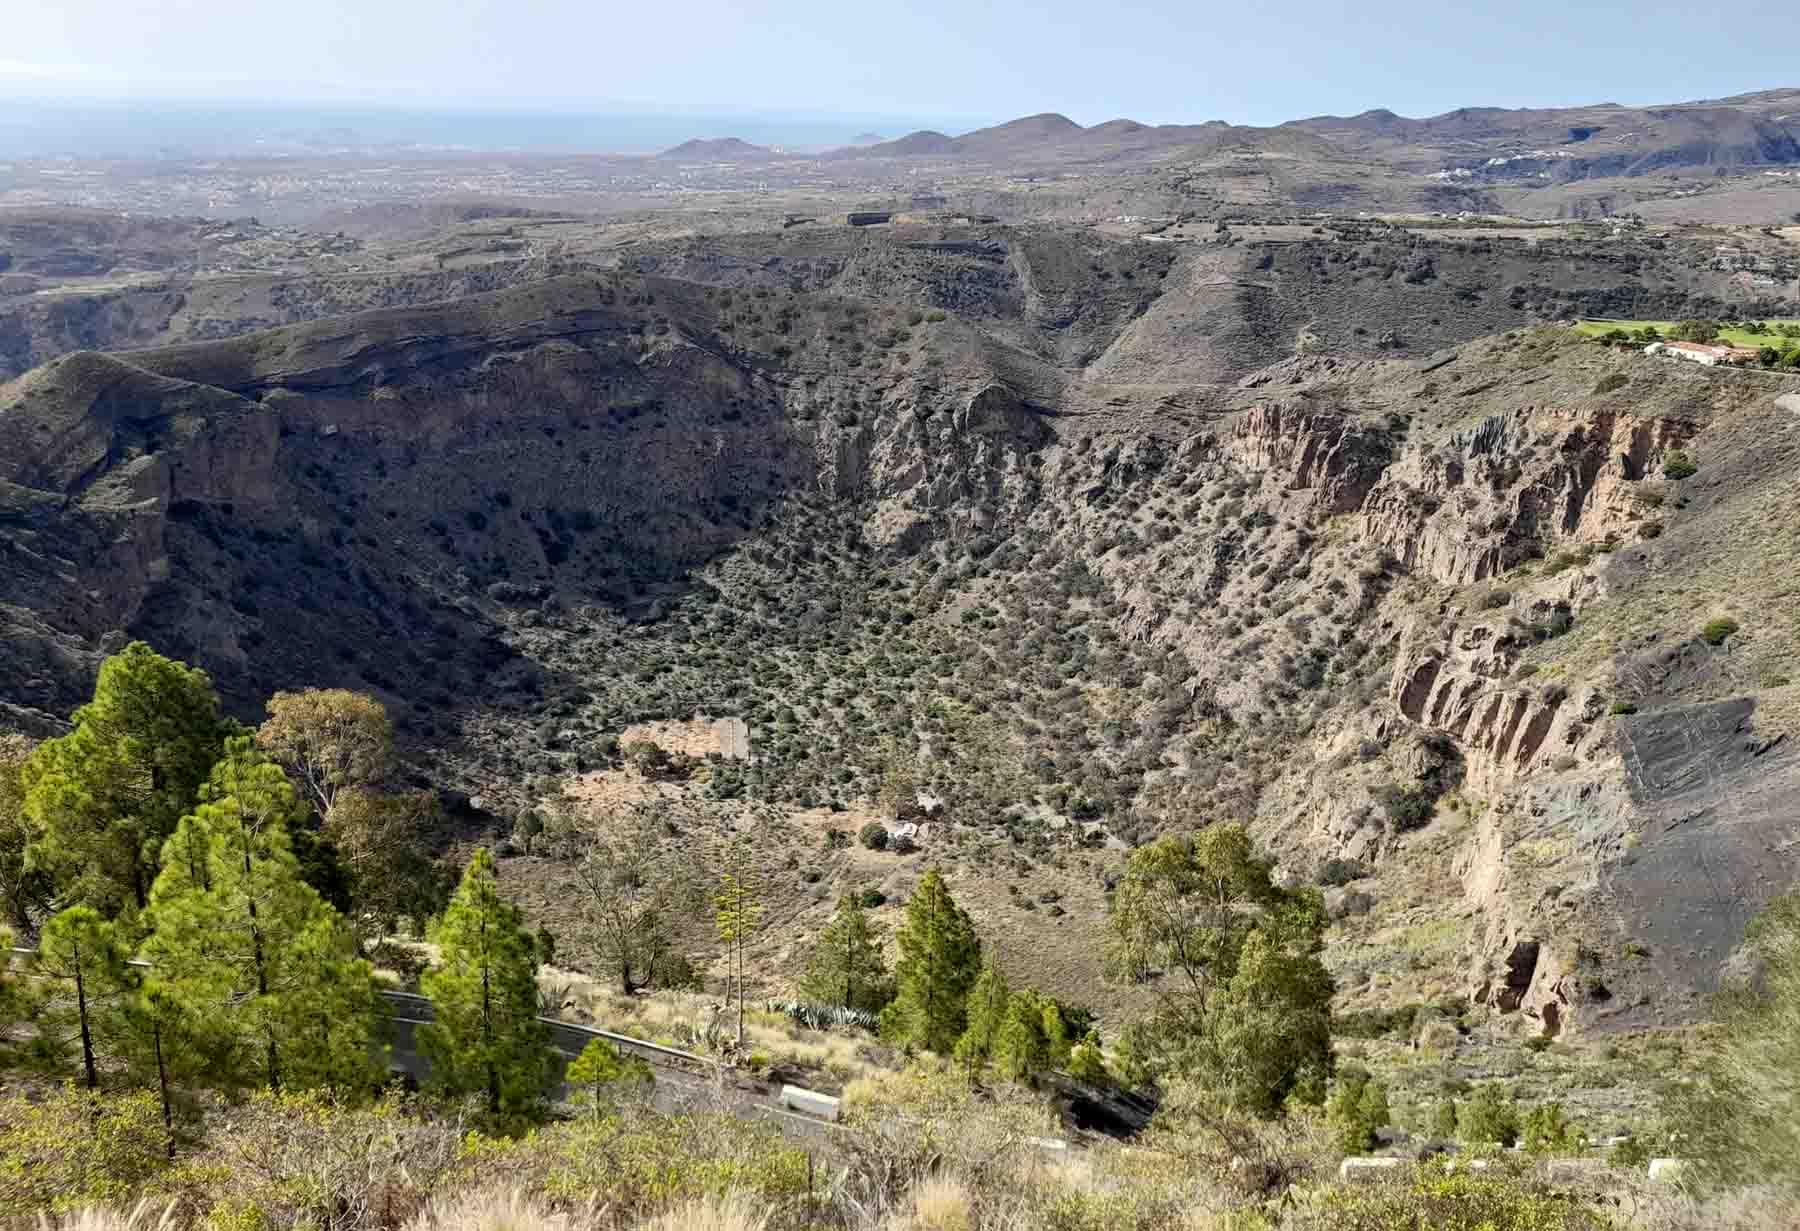 Panorama Caldera de Bandama a Gran Canaria